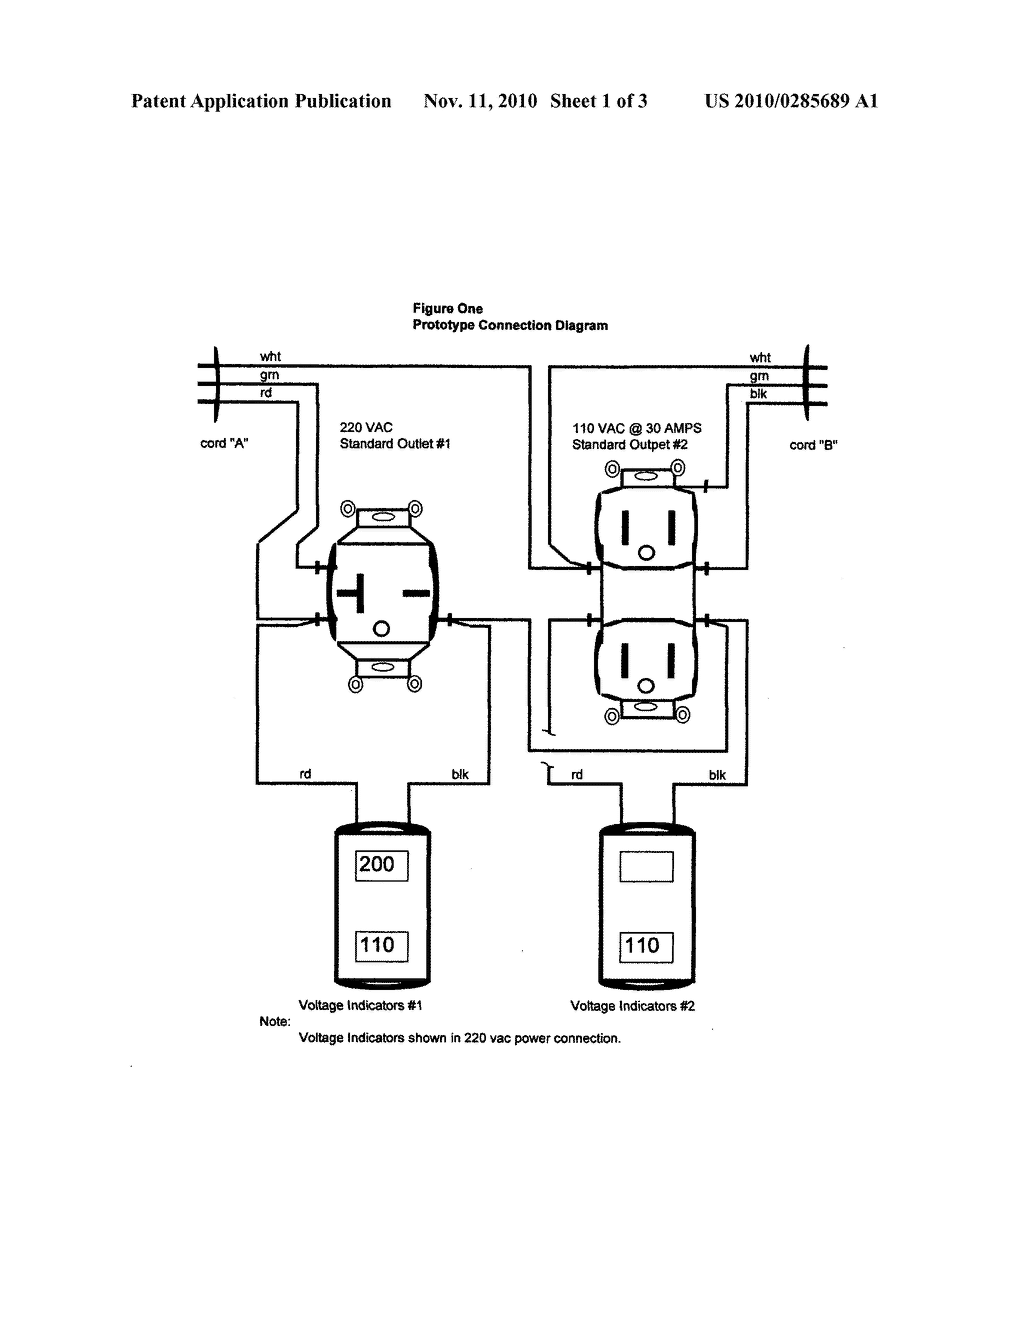 hight resolution of 110 volt plug wiring diagram wiring library110 to 220 volt wiring diagram schema wiring diagram online